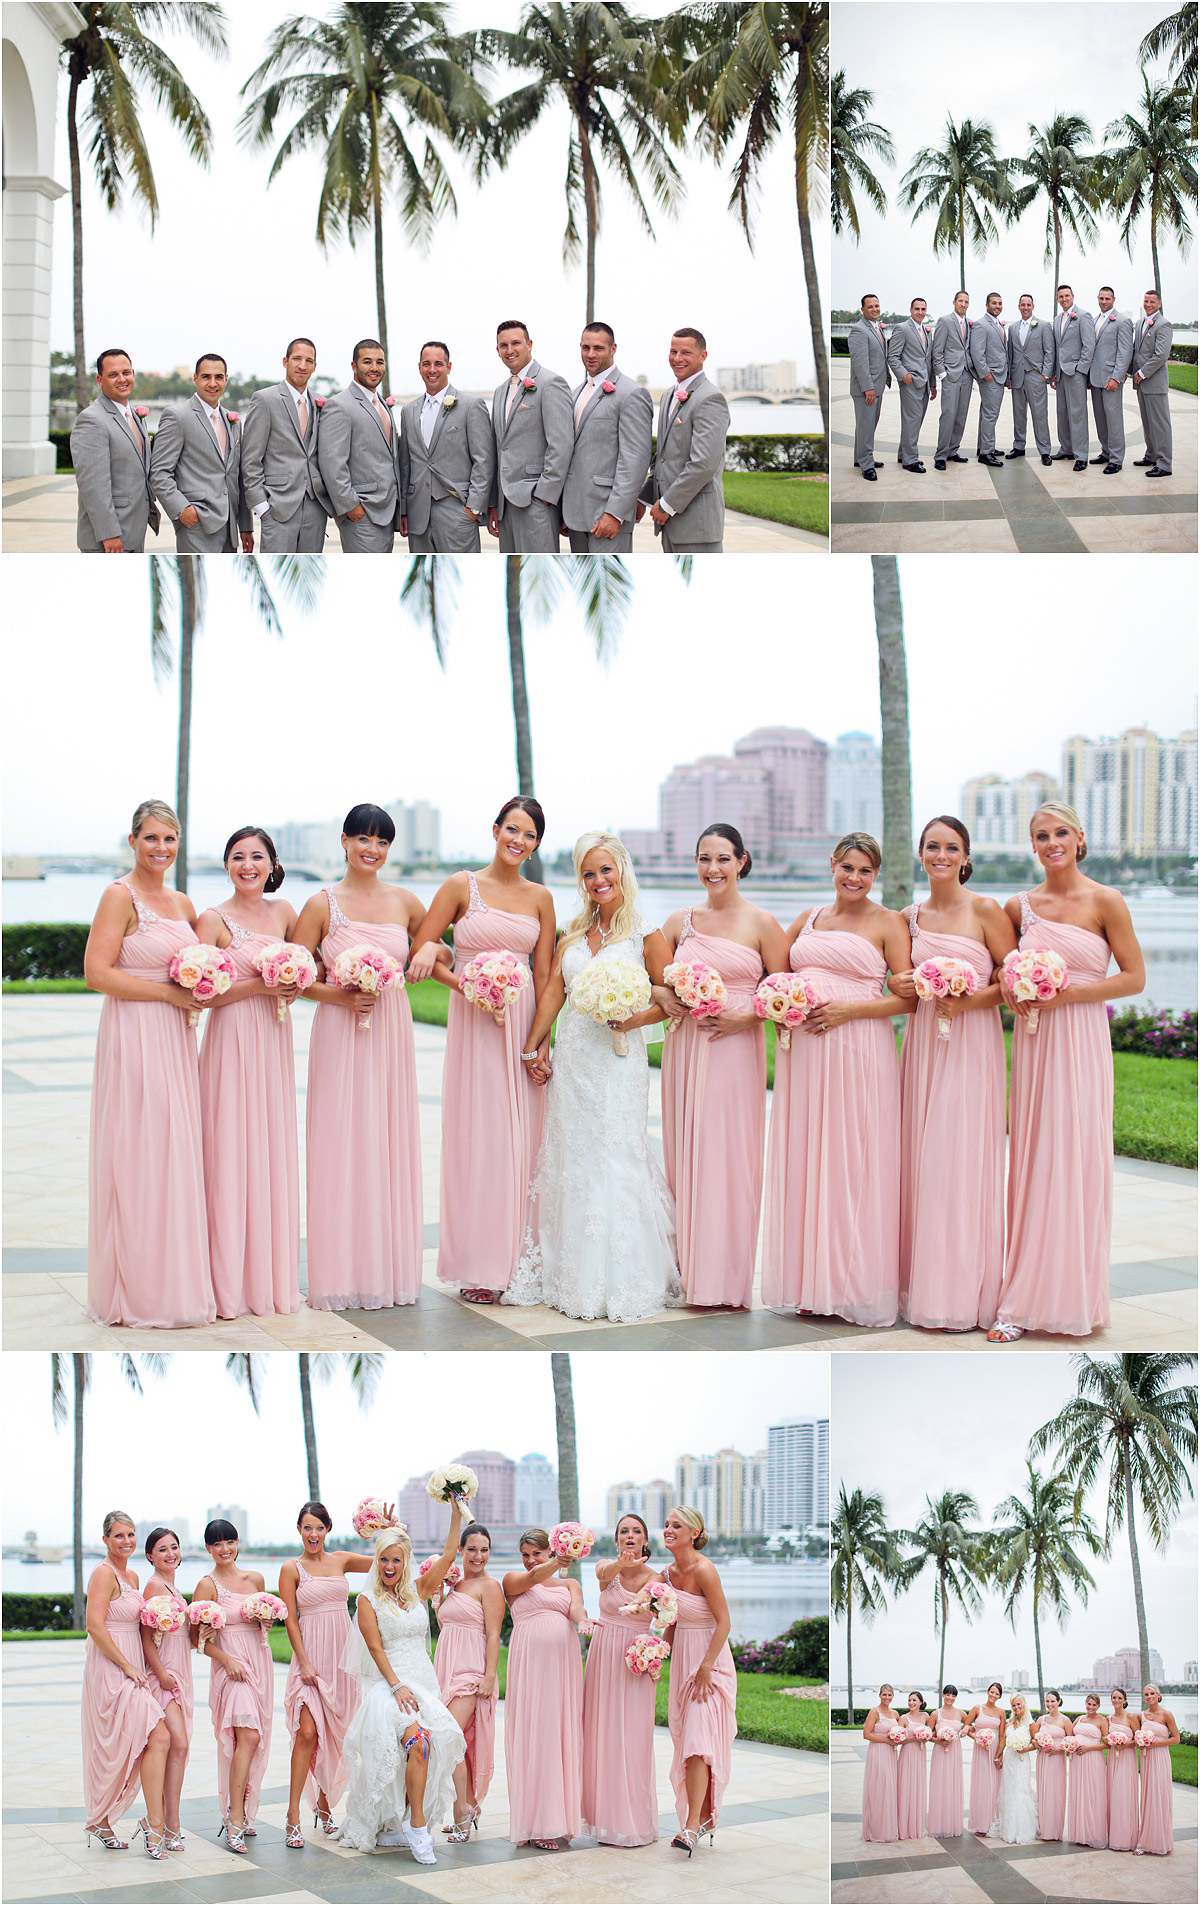 Flagler_Museum_wedding_Palm_Beach_18